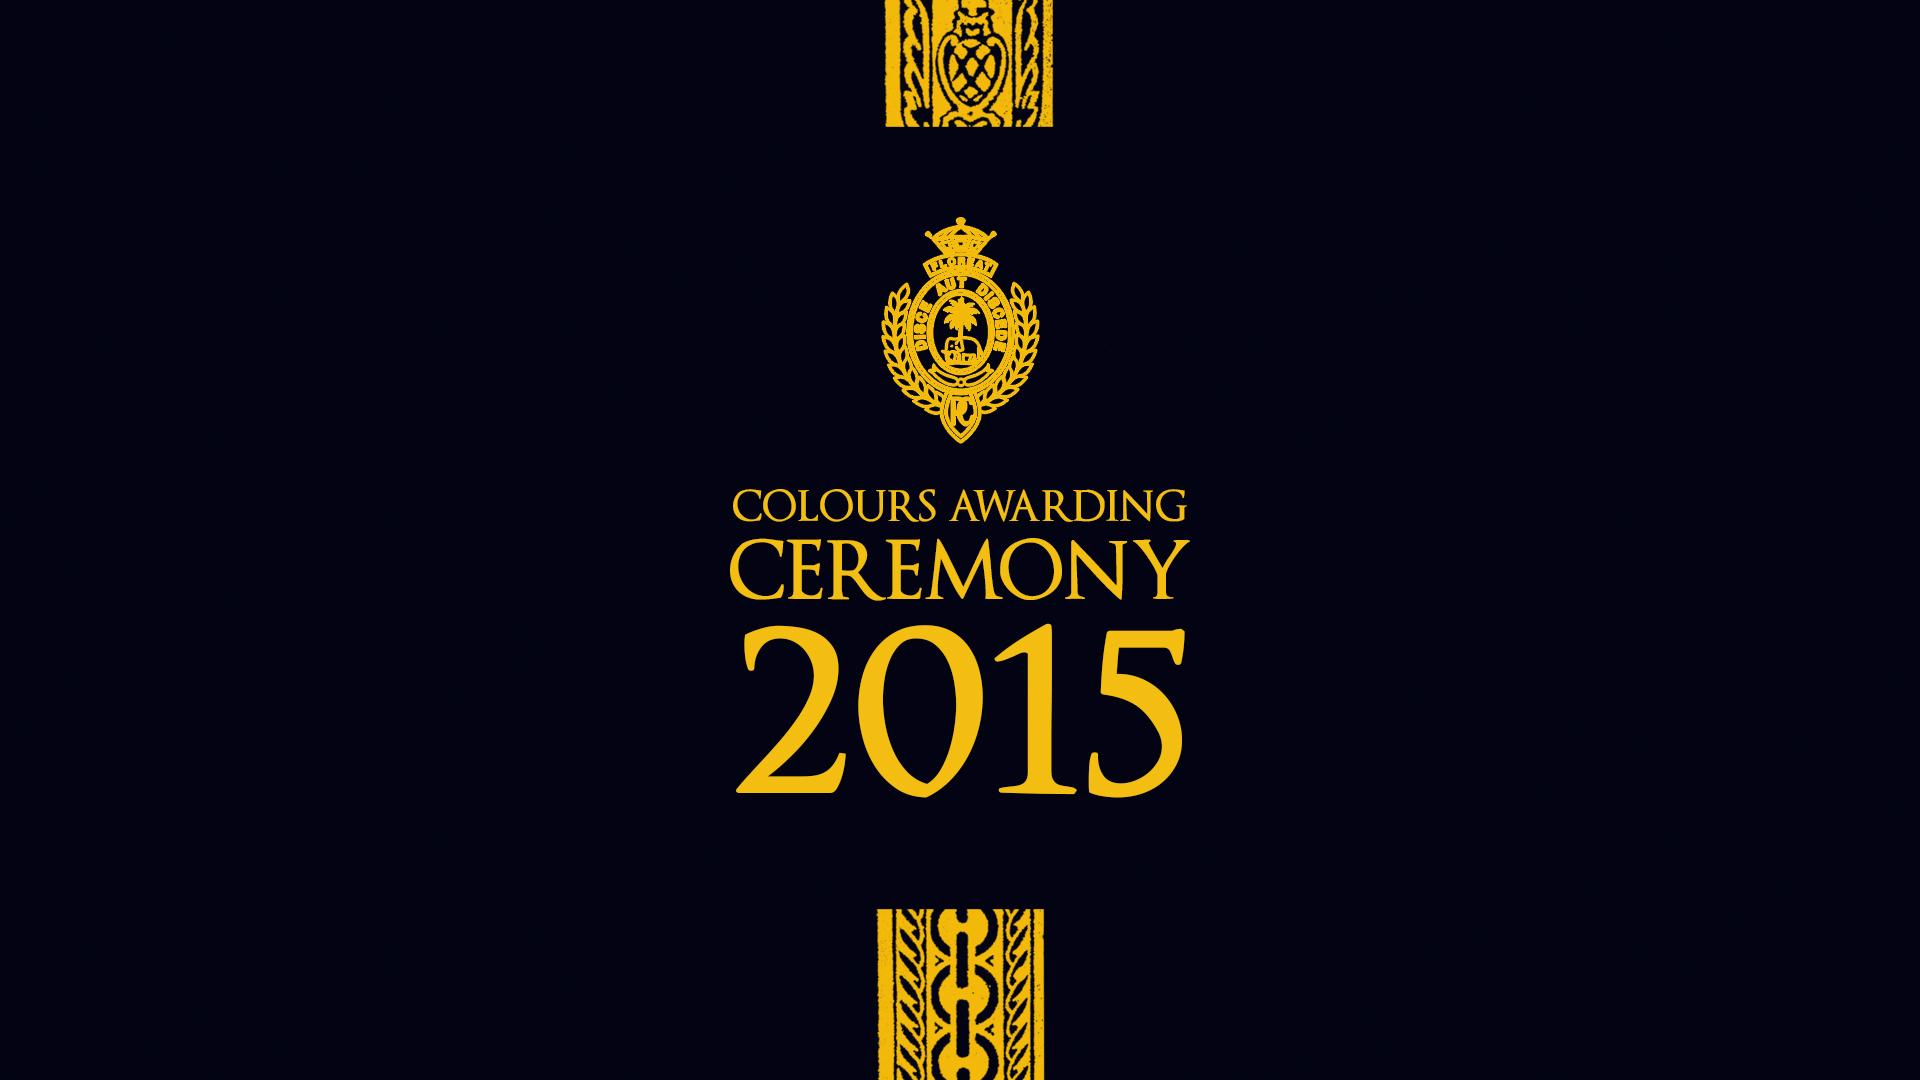 Colours Awarding Ceremony 2015